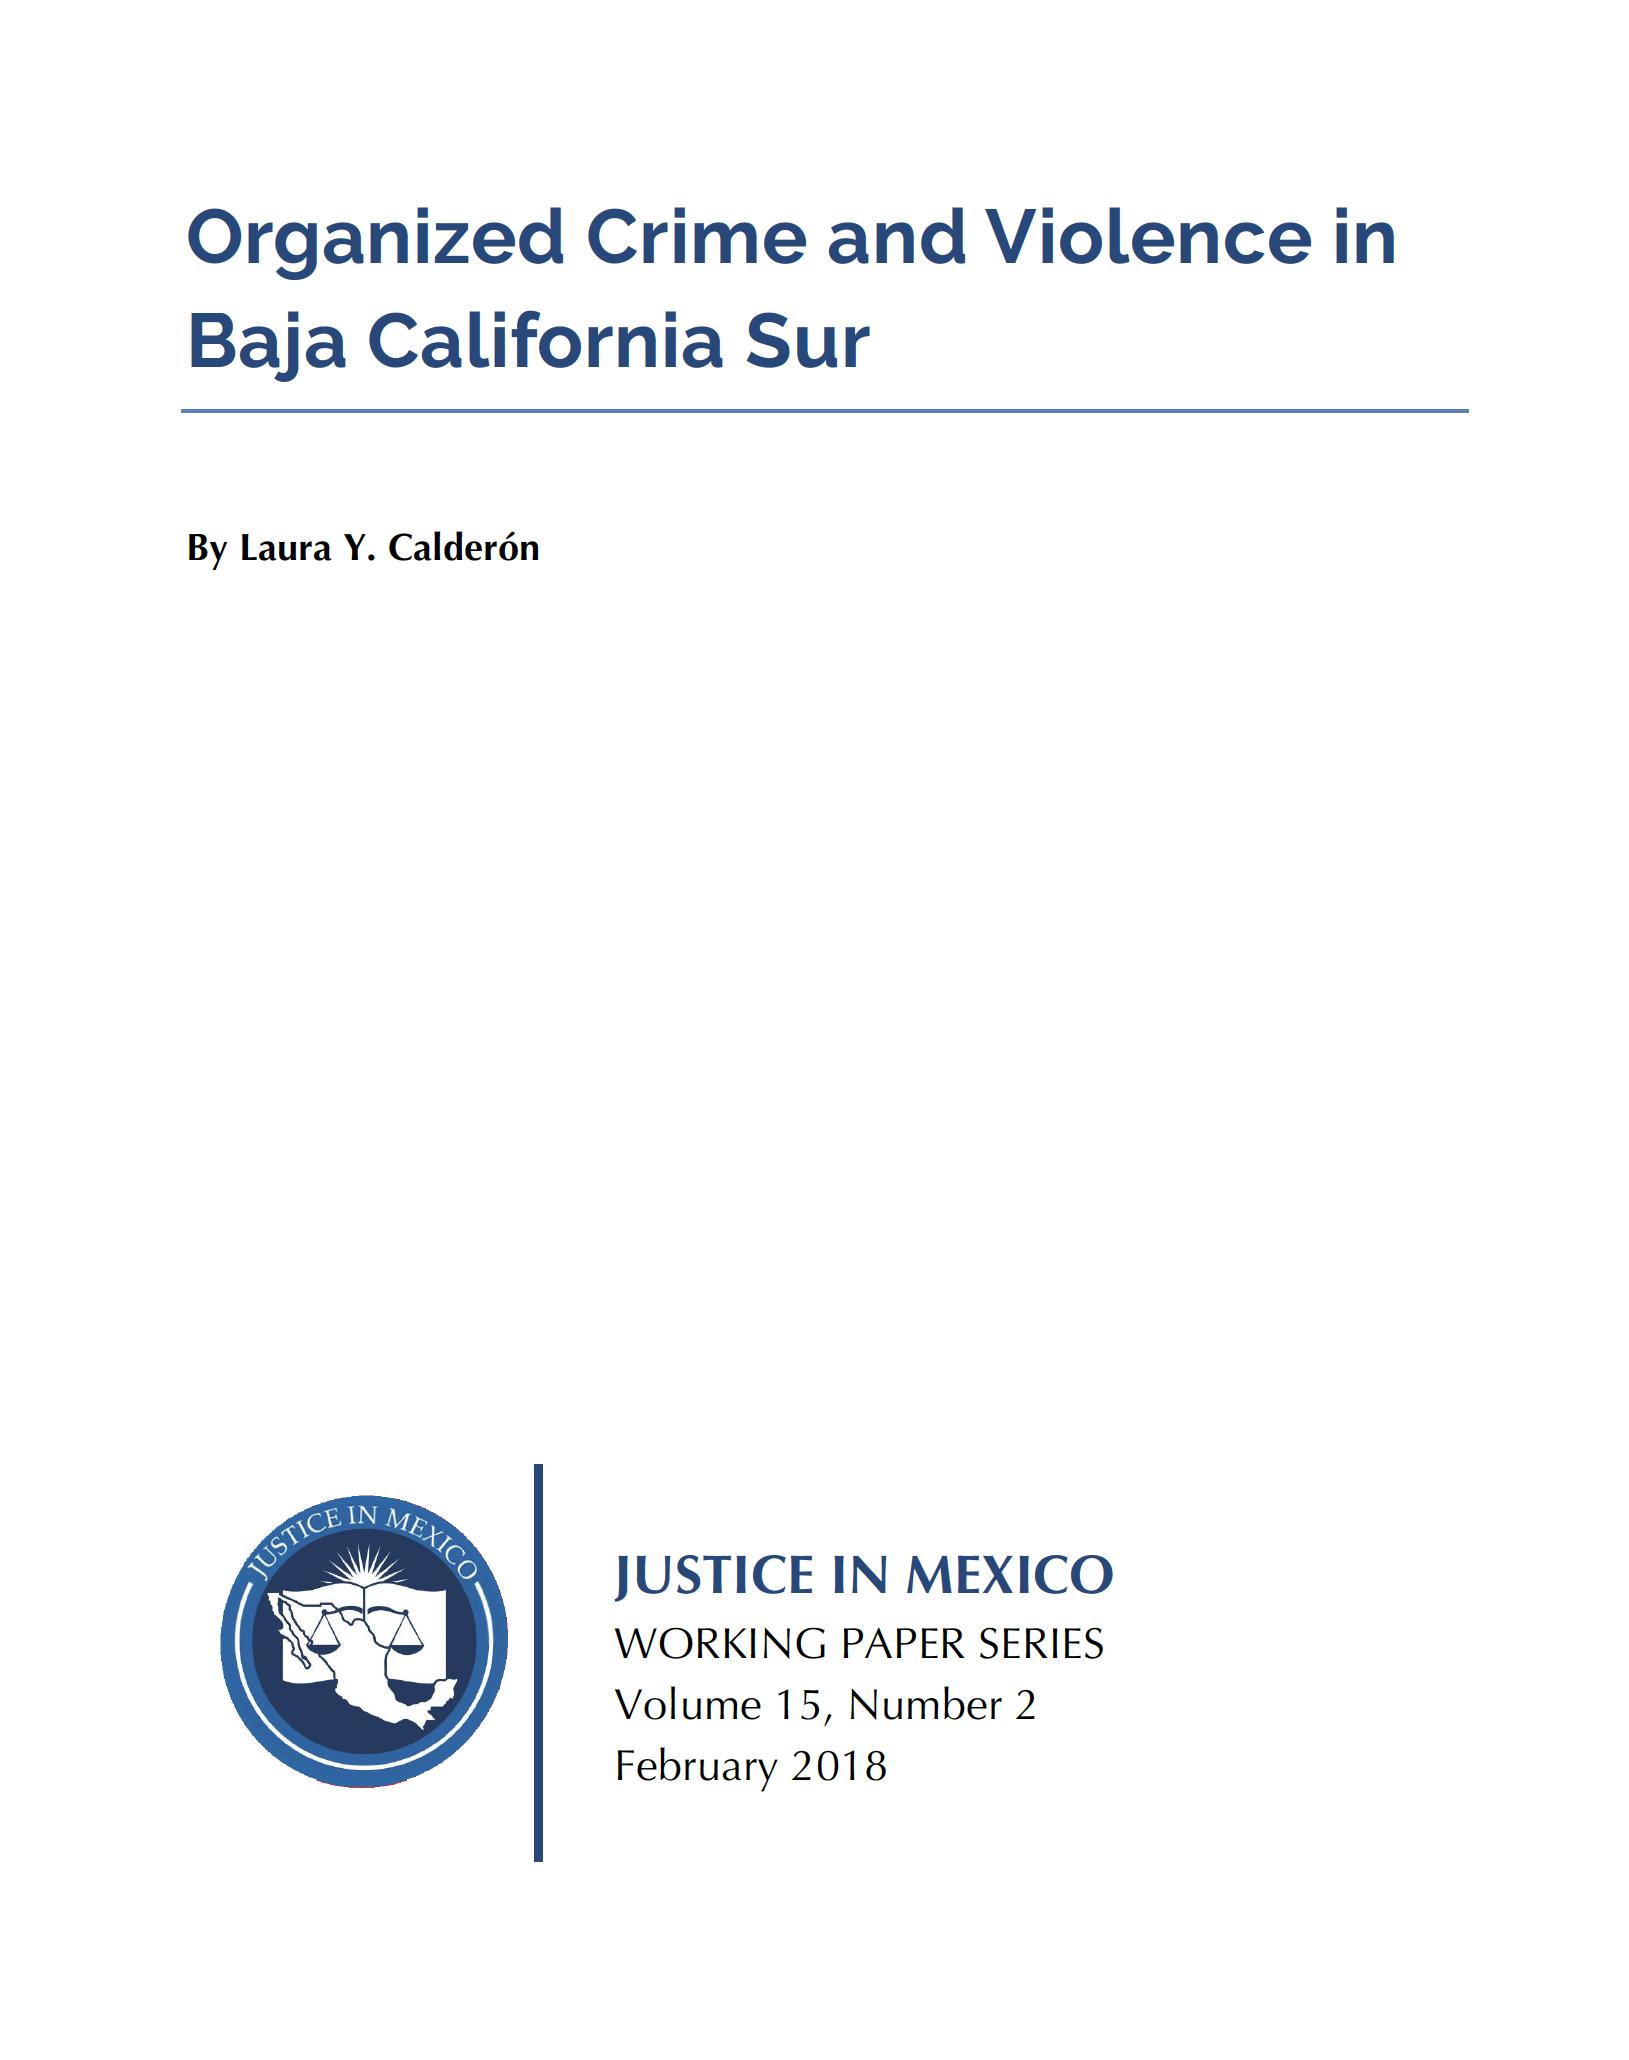 Organized Crime and Violence in Baja California Sur